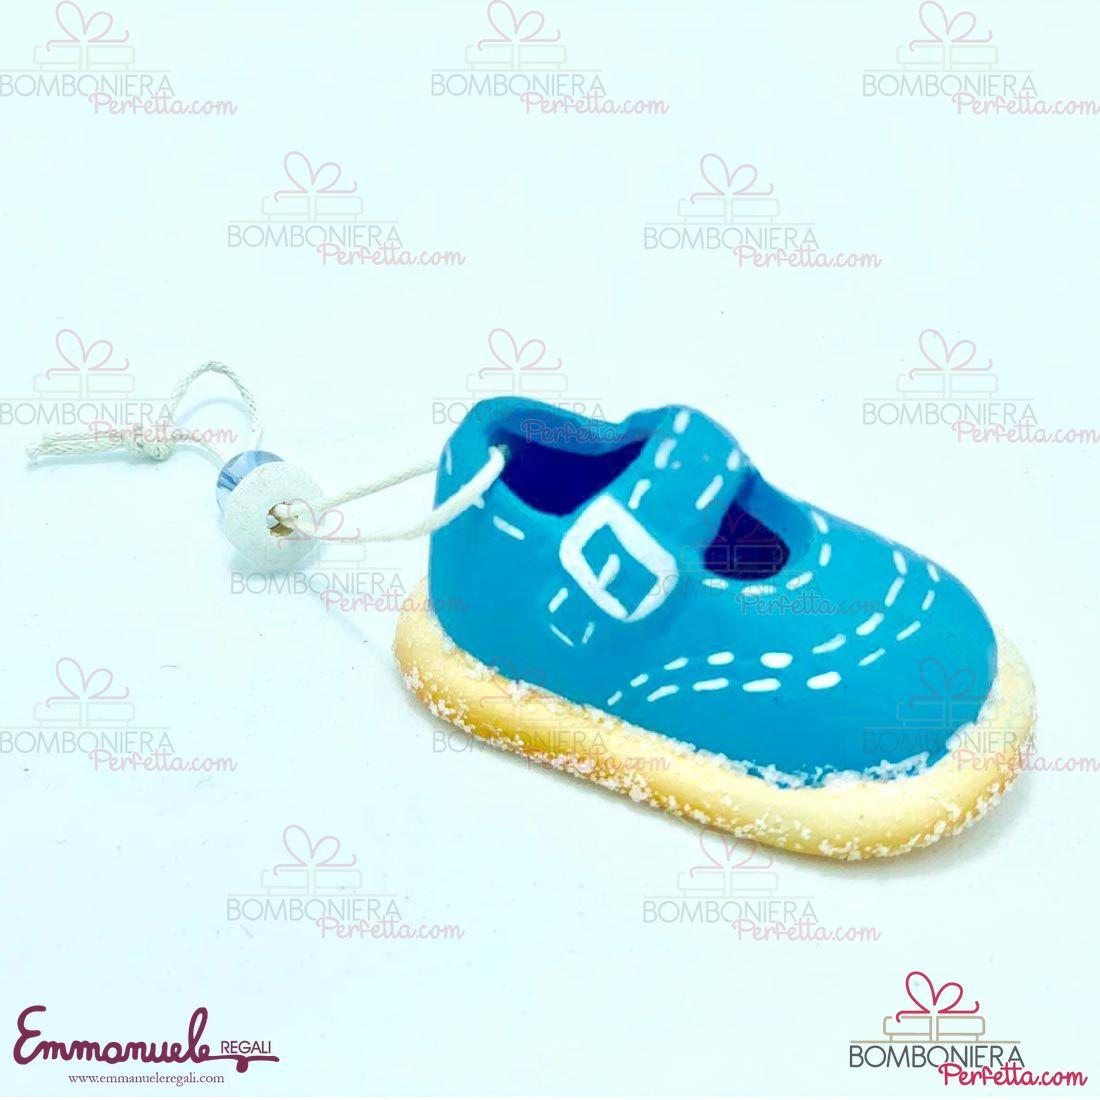 scarpa_nascita_emmanueleregali_bombonieraperfetta_ngr0-cd